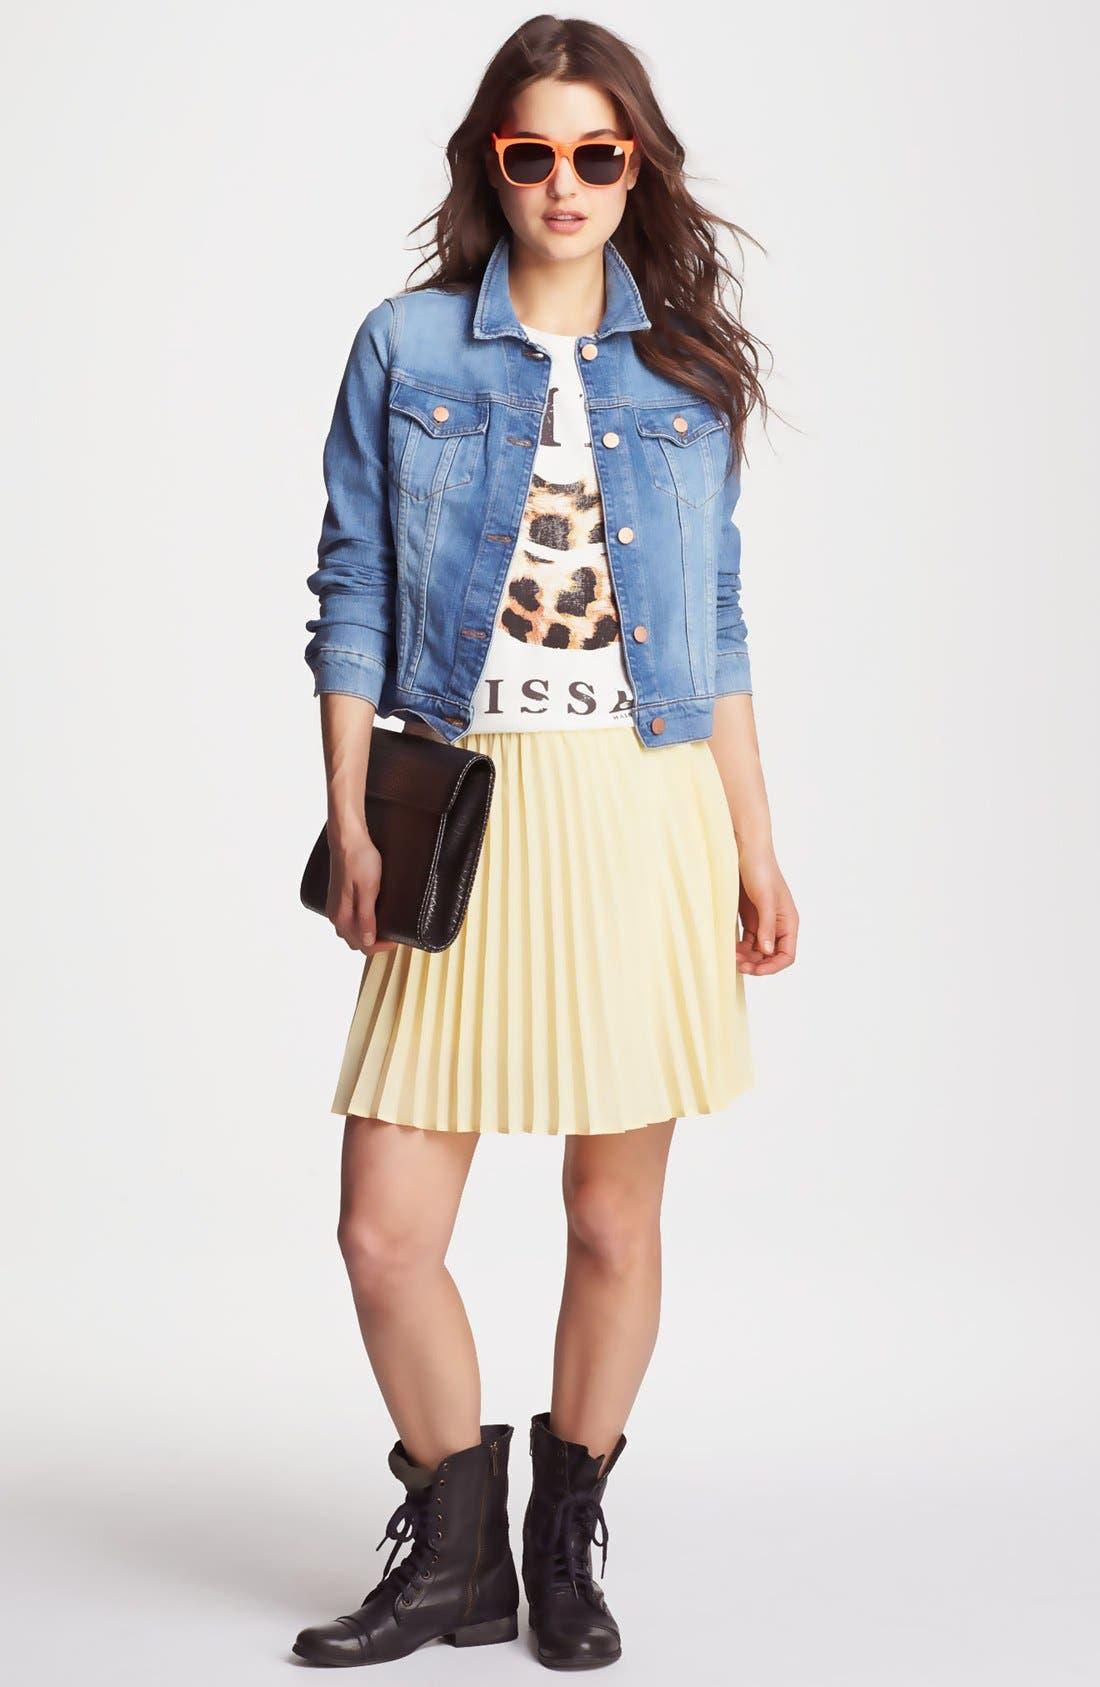 Main Image - J Brand Jacket, Maison Scotch Tank, Willow & Clay Skirt